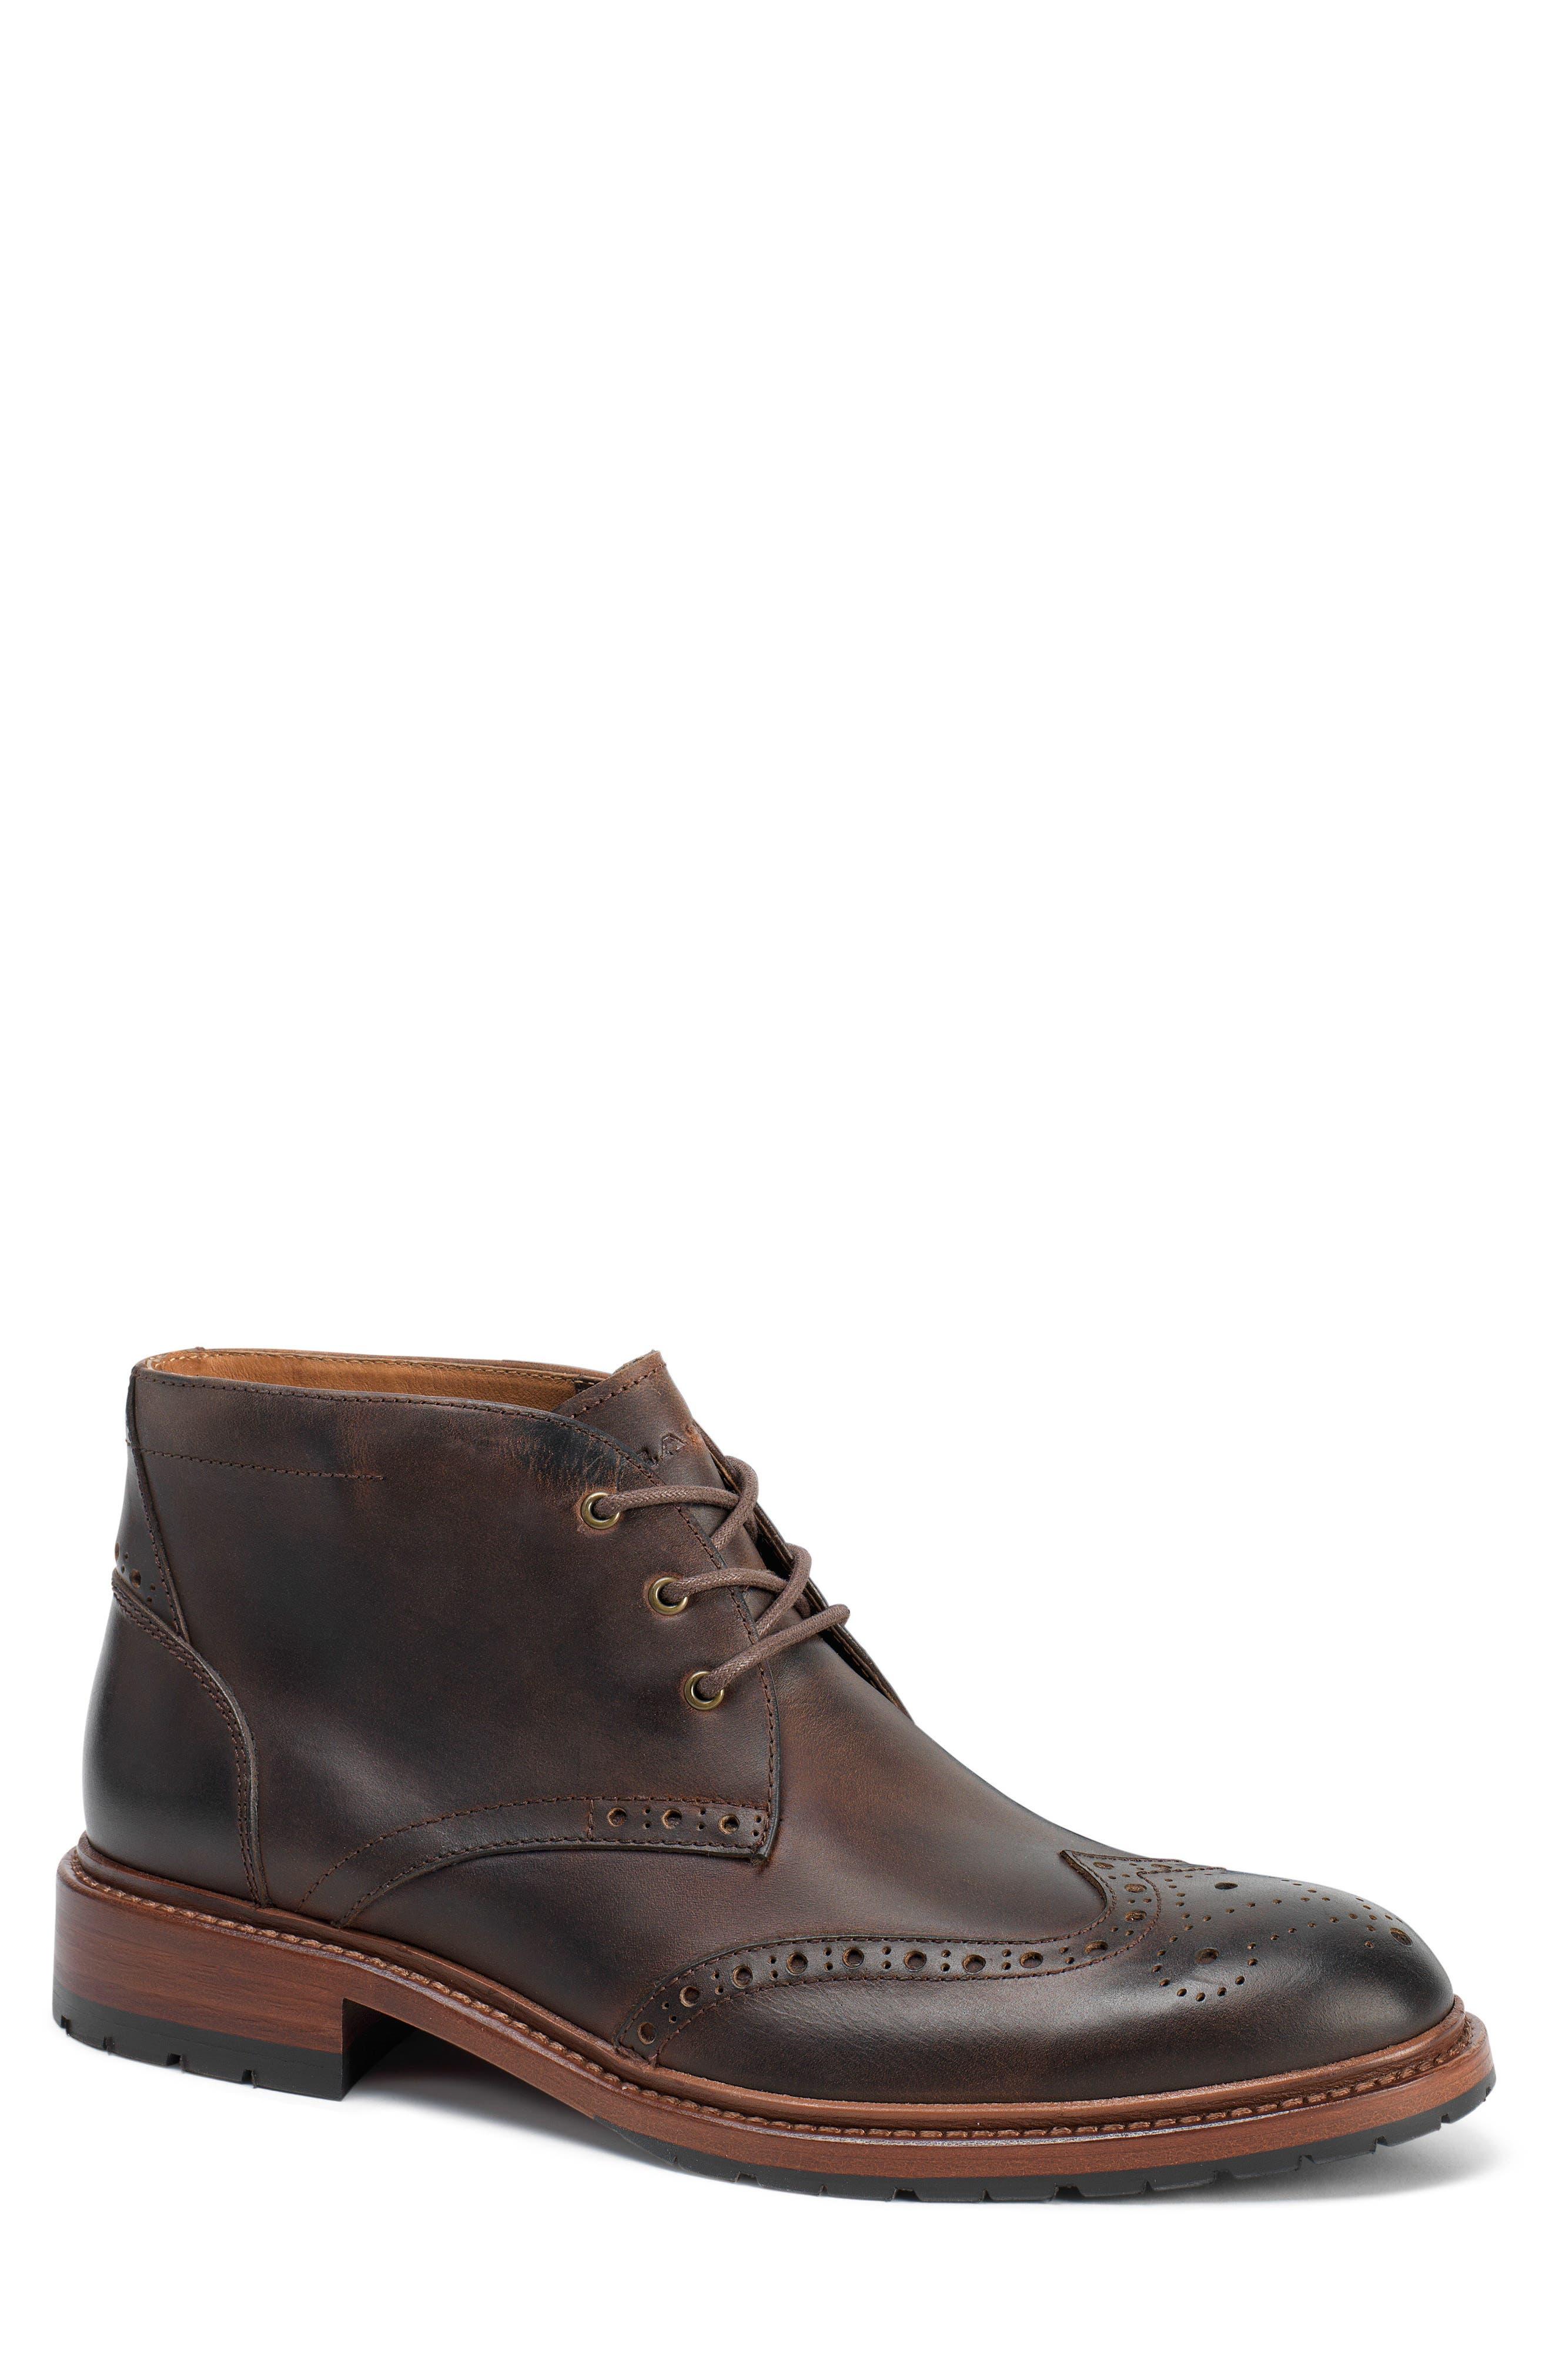 'Lawson' Wingtip Boot,                         Main,                         color, BROWN OILED AMERICAN STEER